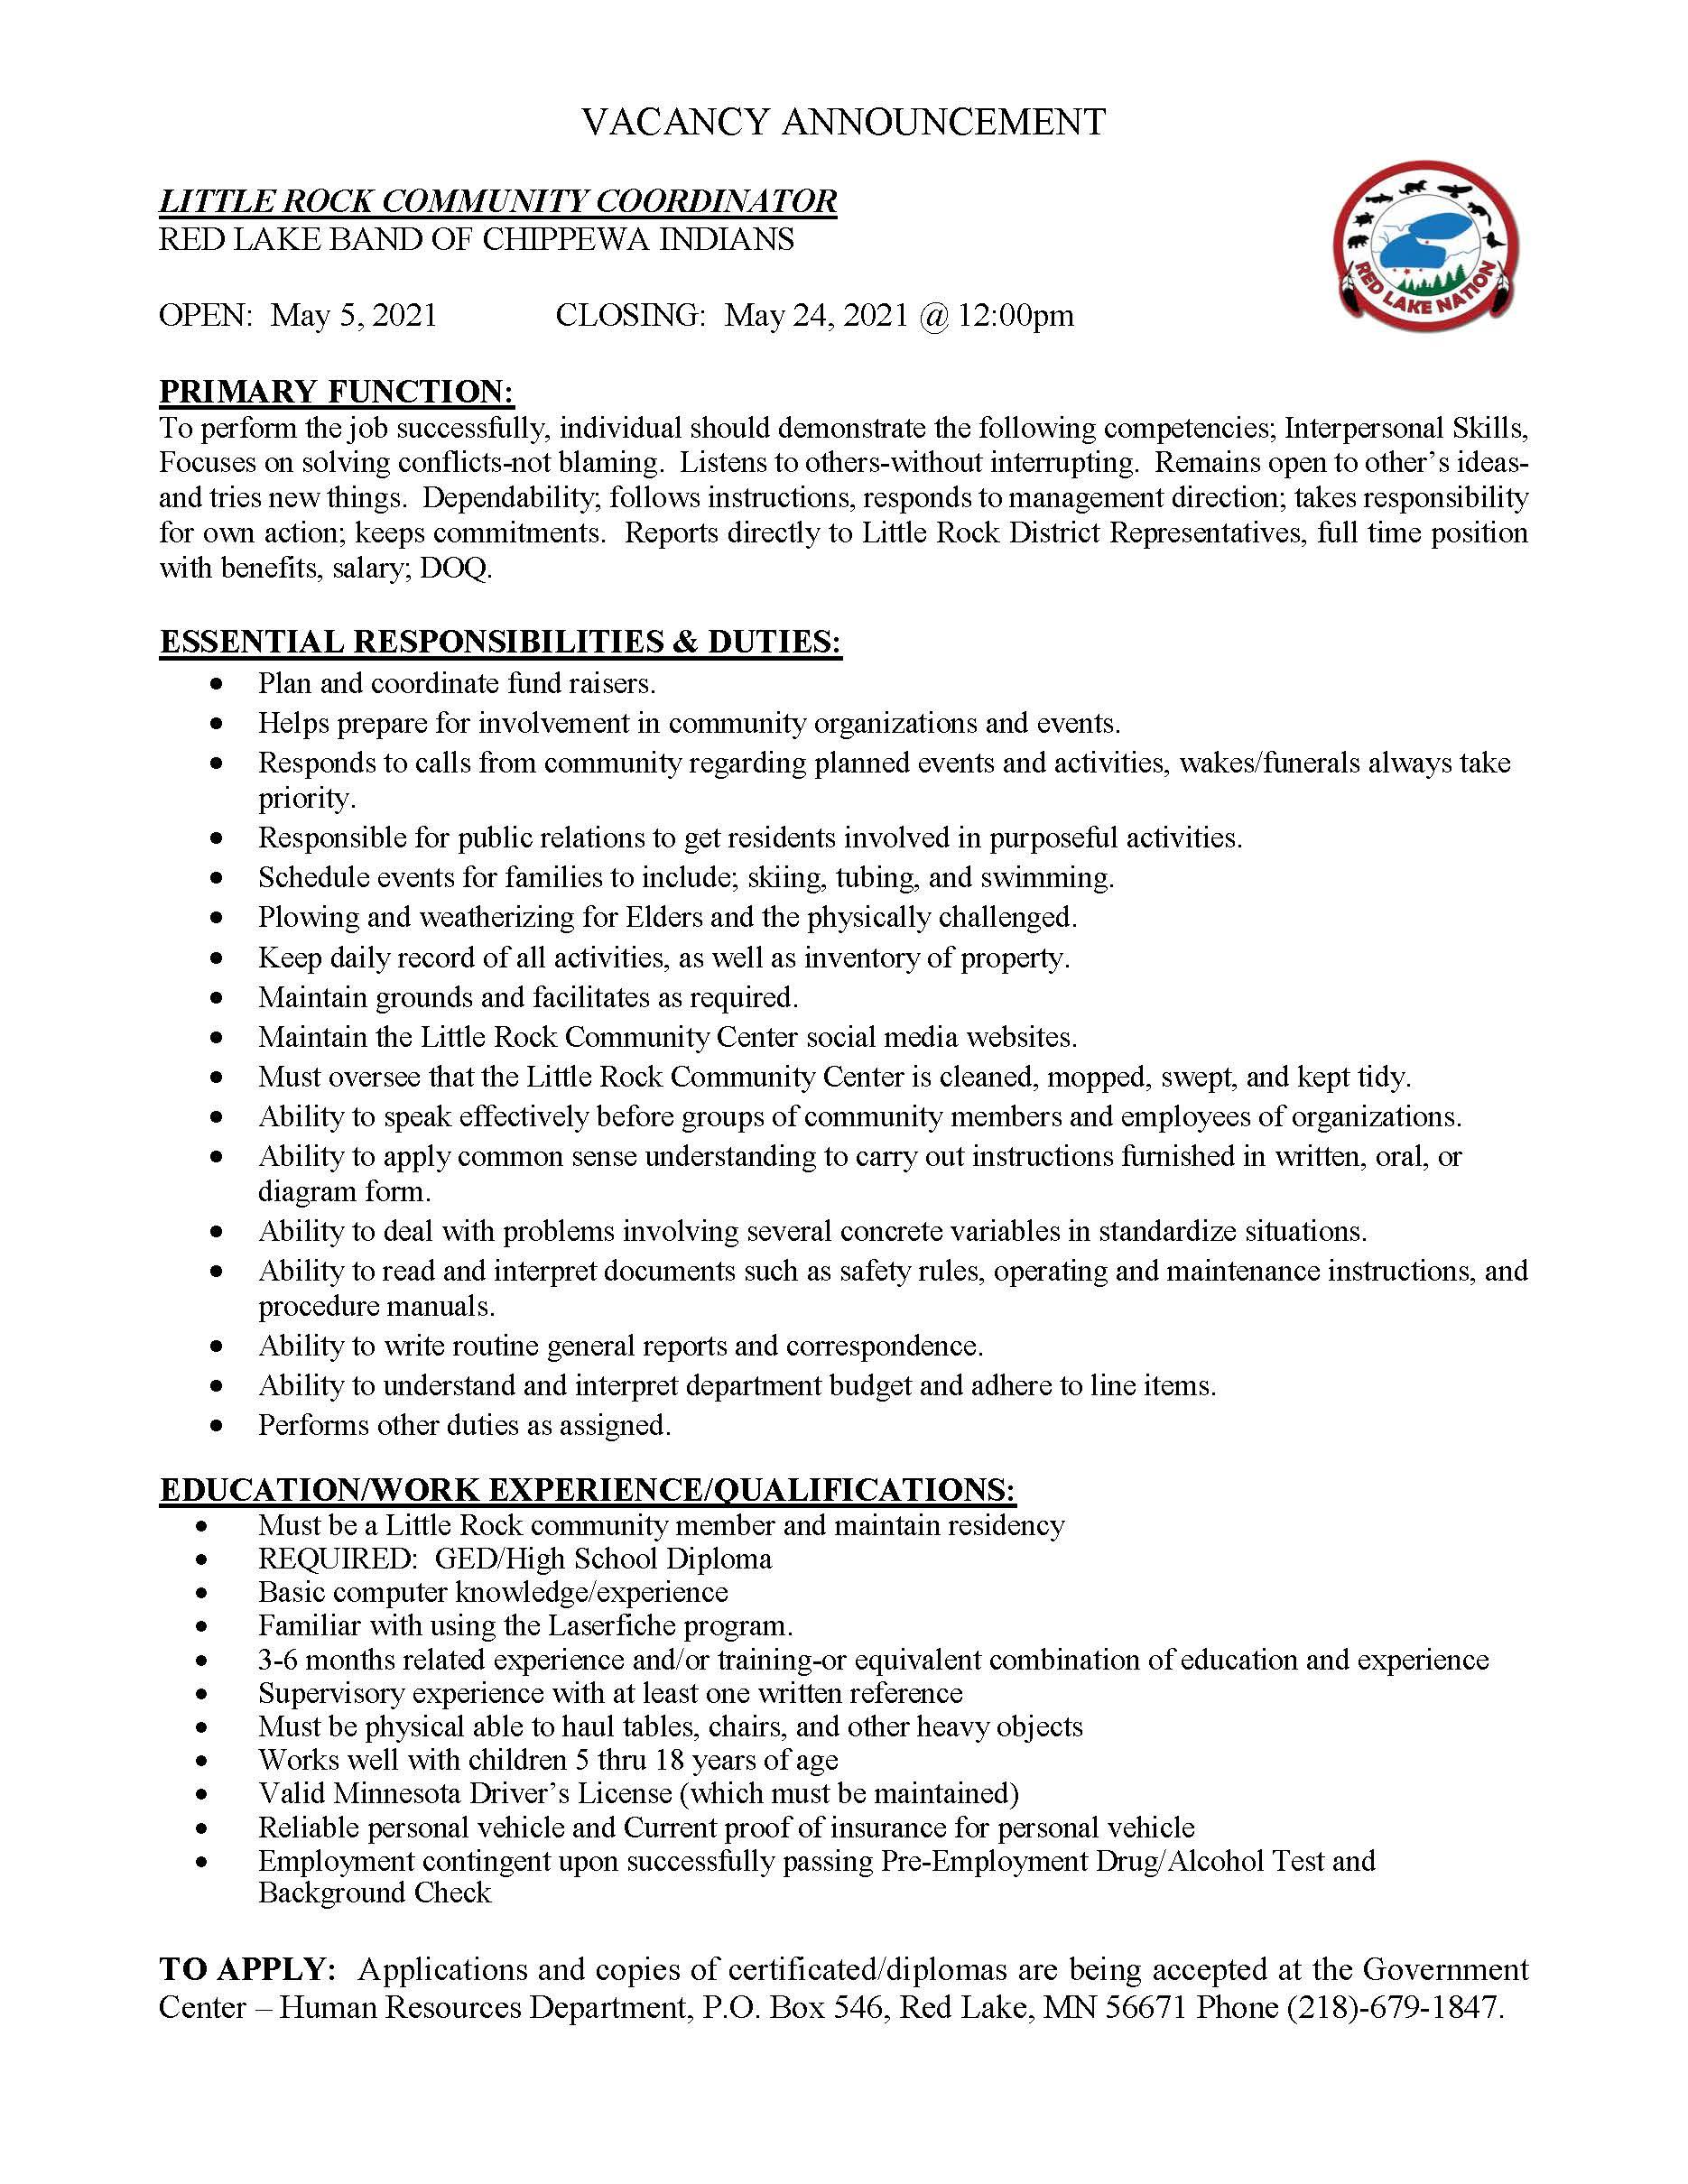 Little Rock Community Coordinator Job Description-5-4-2021